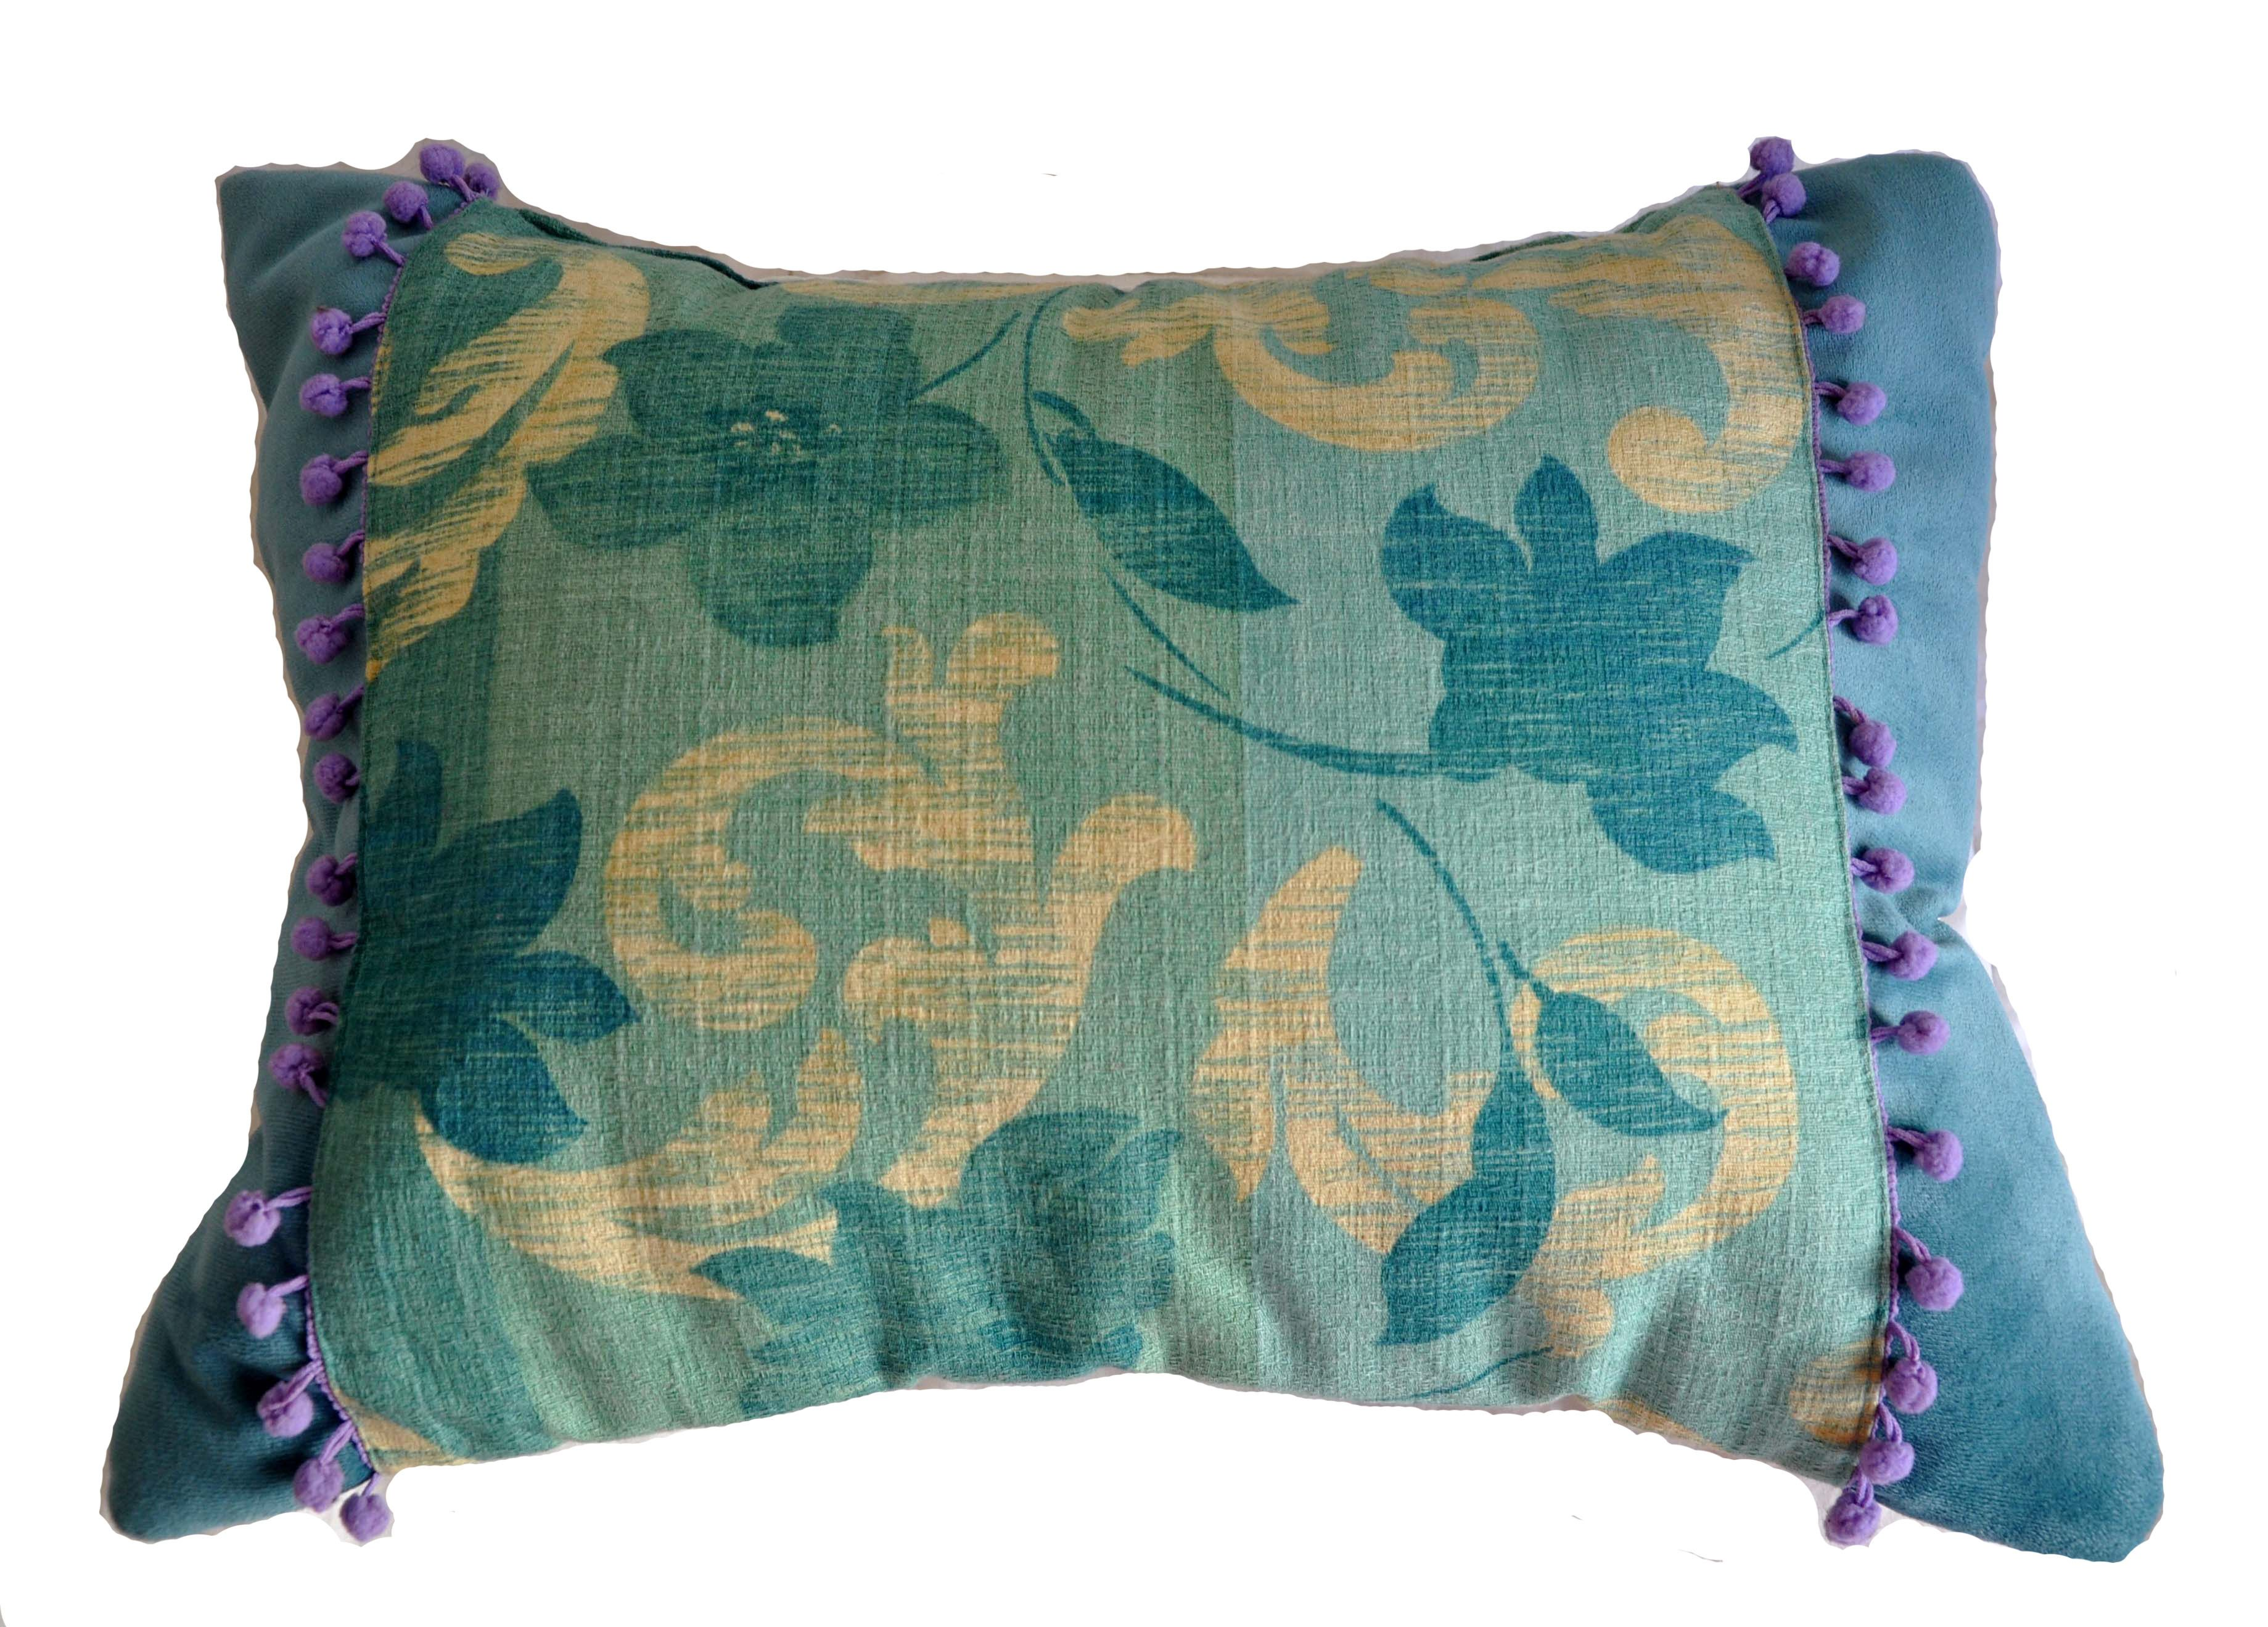 Almohadón Clöe Pana de algodón + Gross Poesia Detalles: galeones lilas Tamaño: 50x30